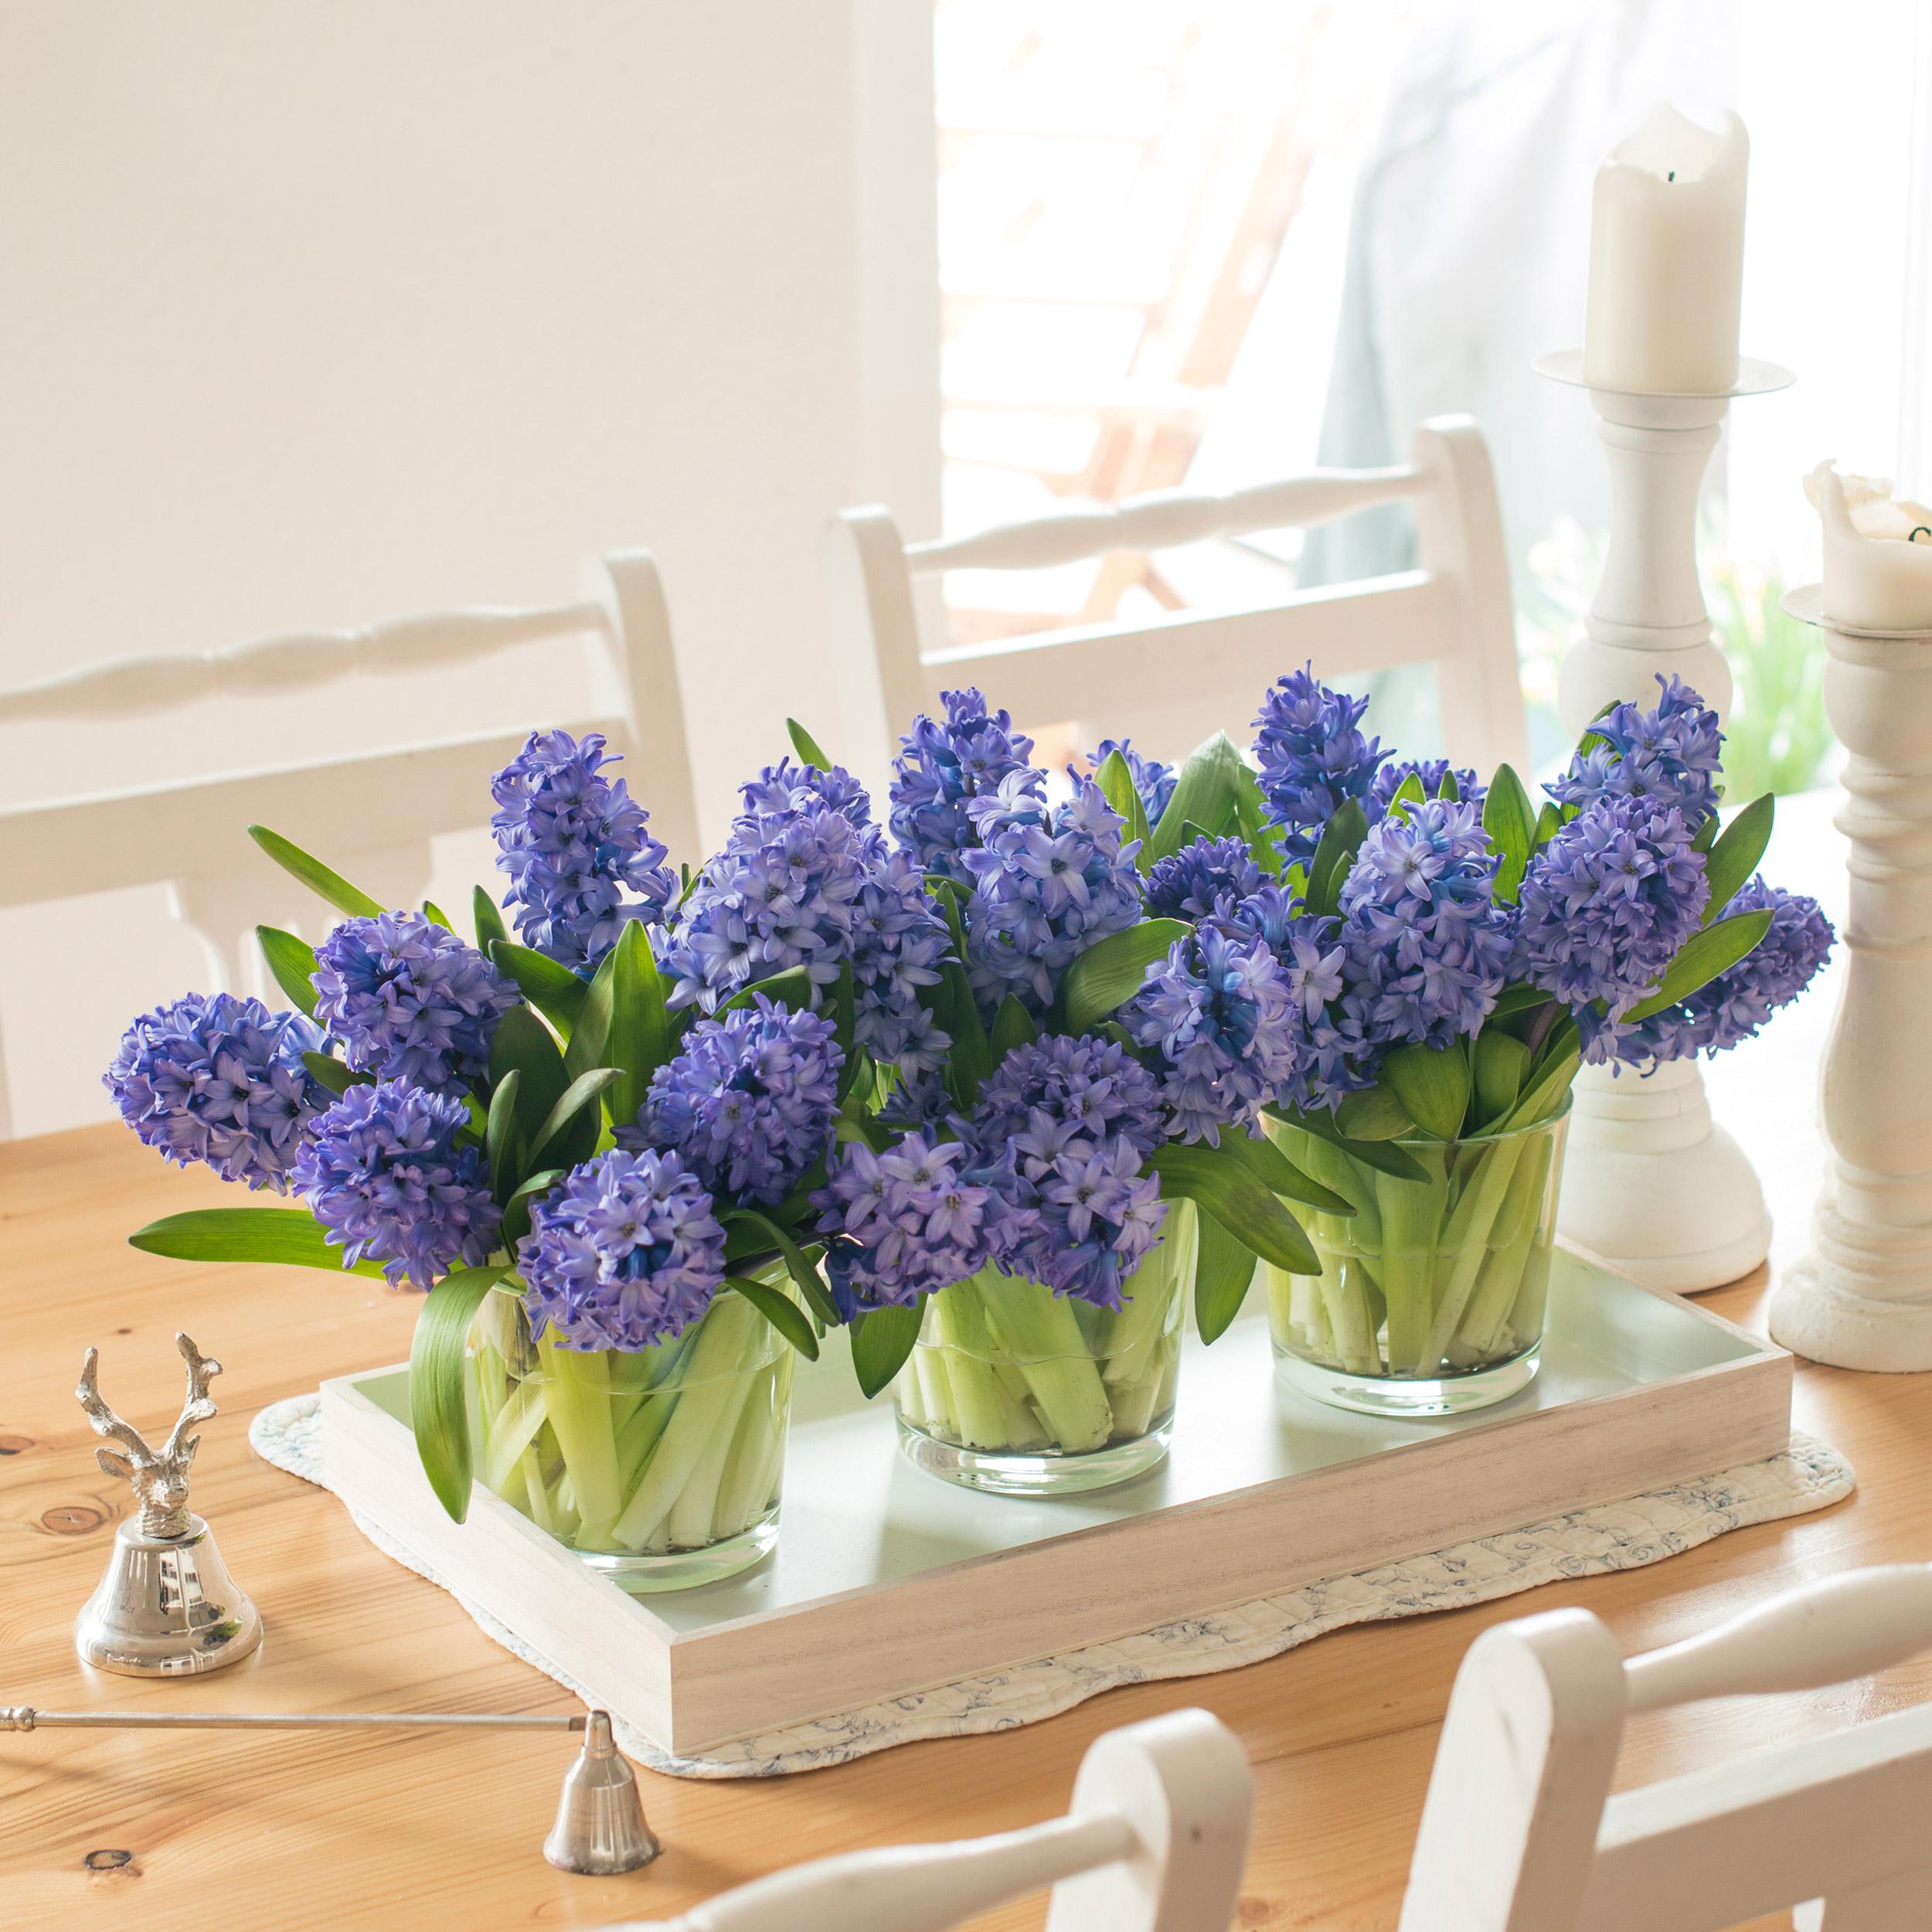 lila-blau-violett-Hyazinthen-Hyacinthus